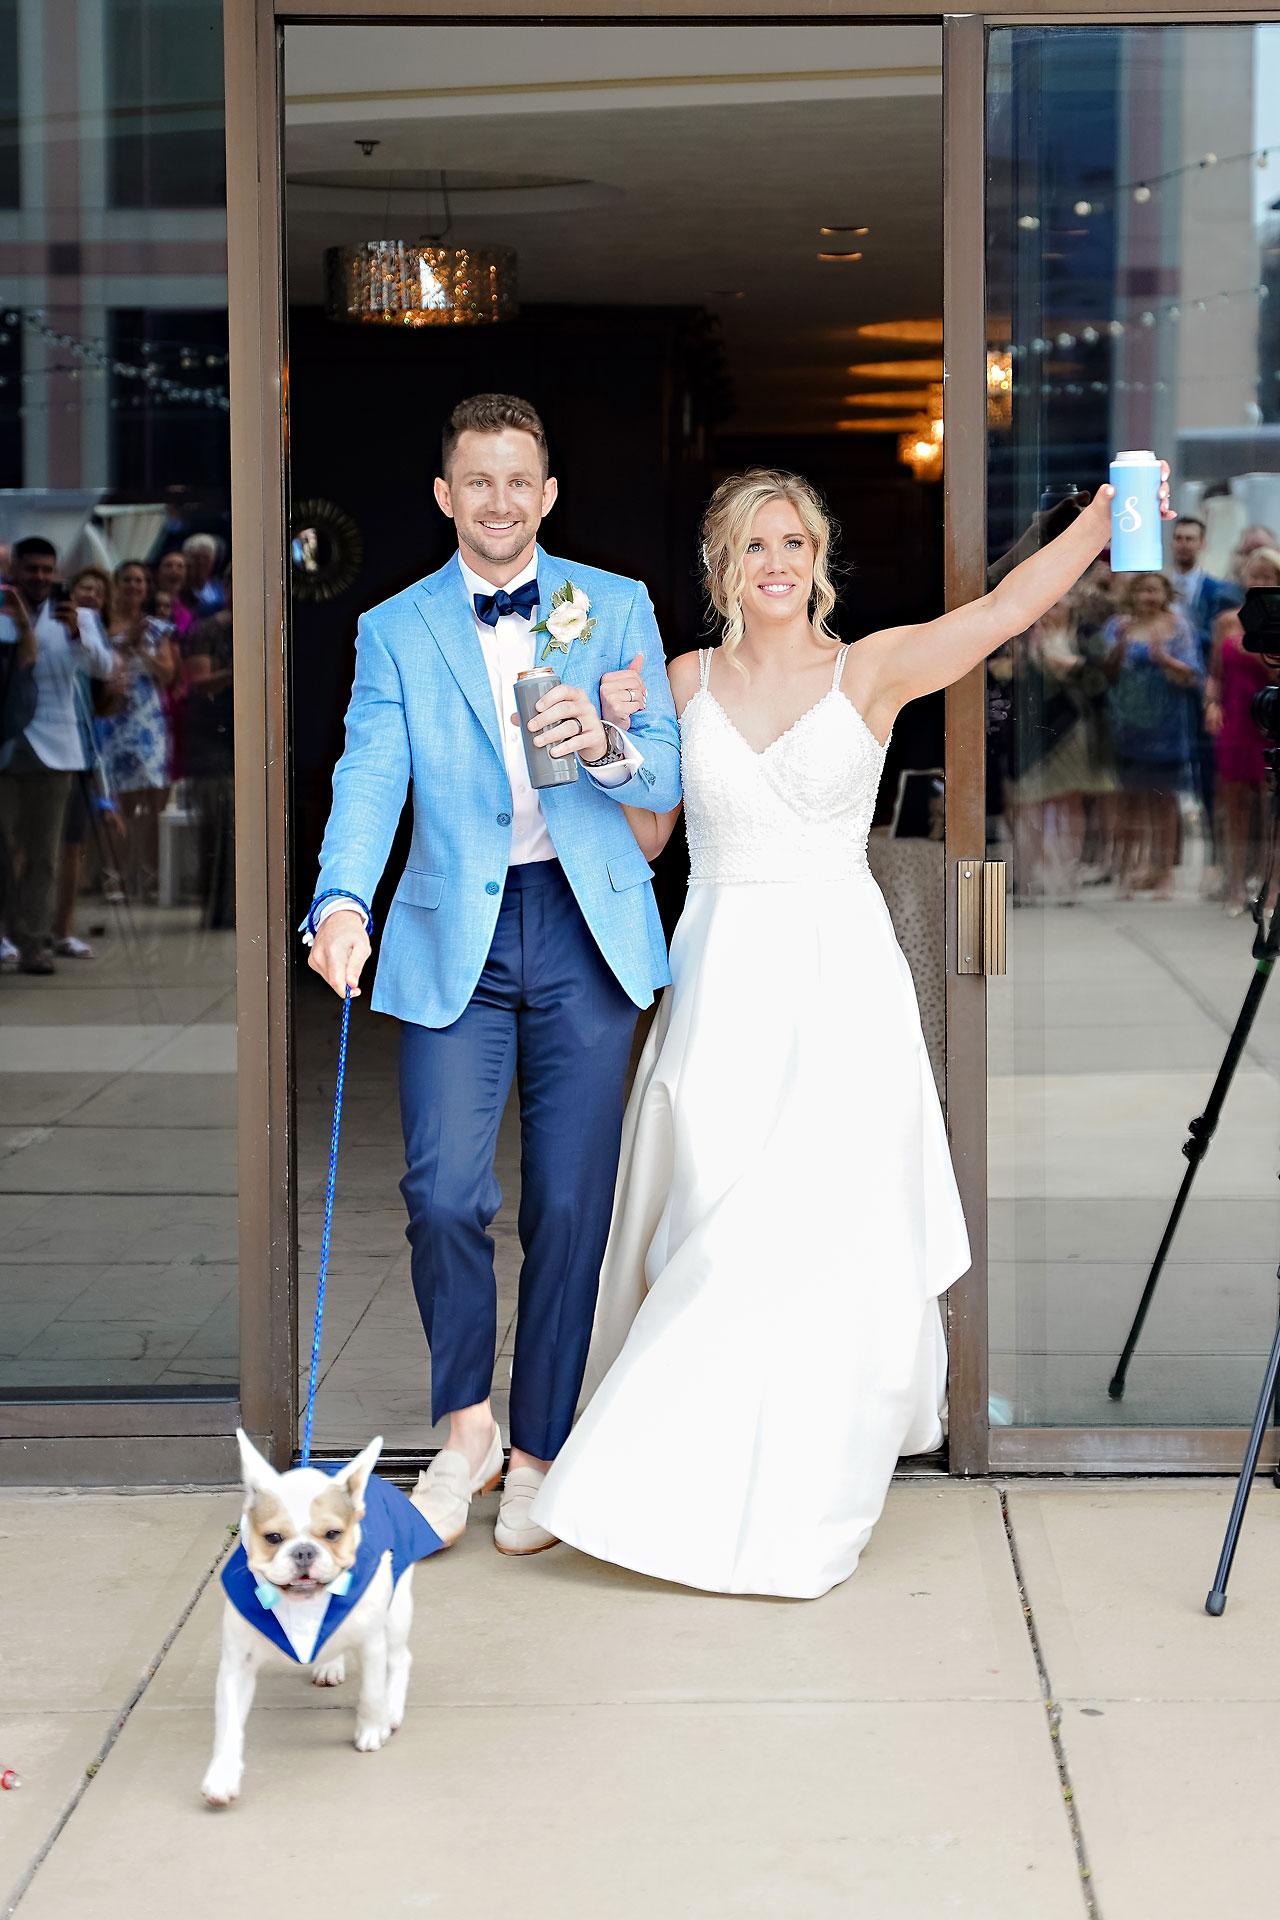 Sammi Jack Regions Tower JPS Events Indianapolis Wedding 259